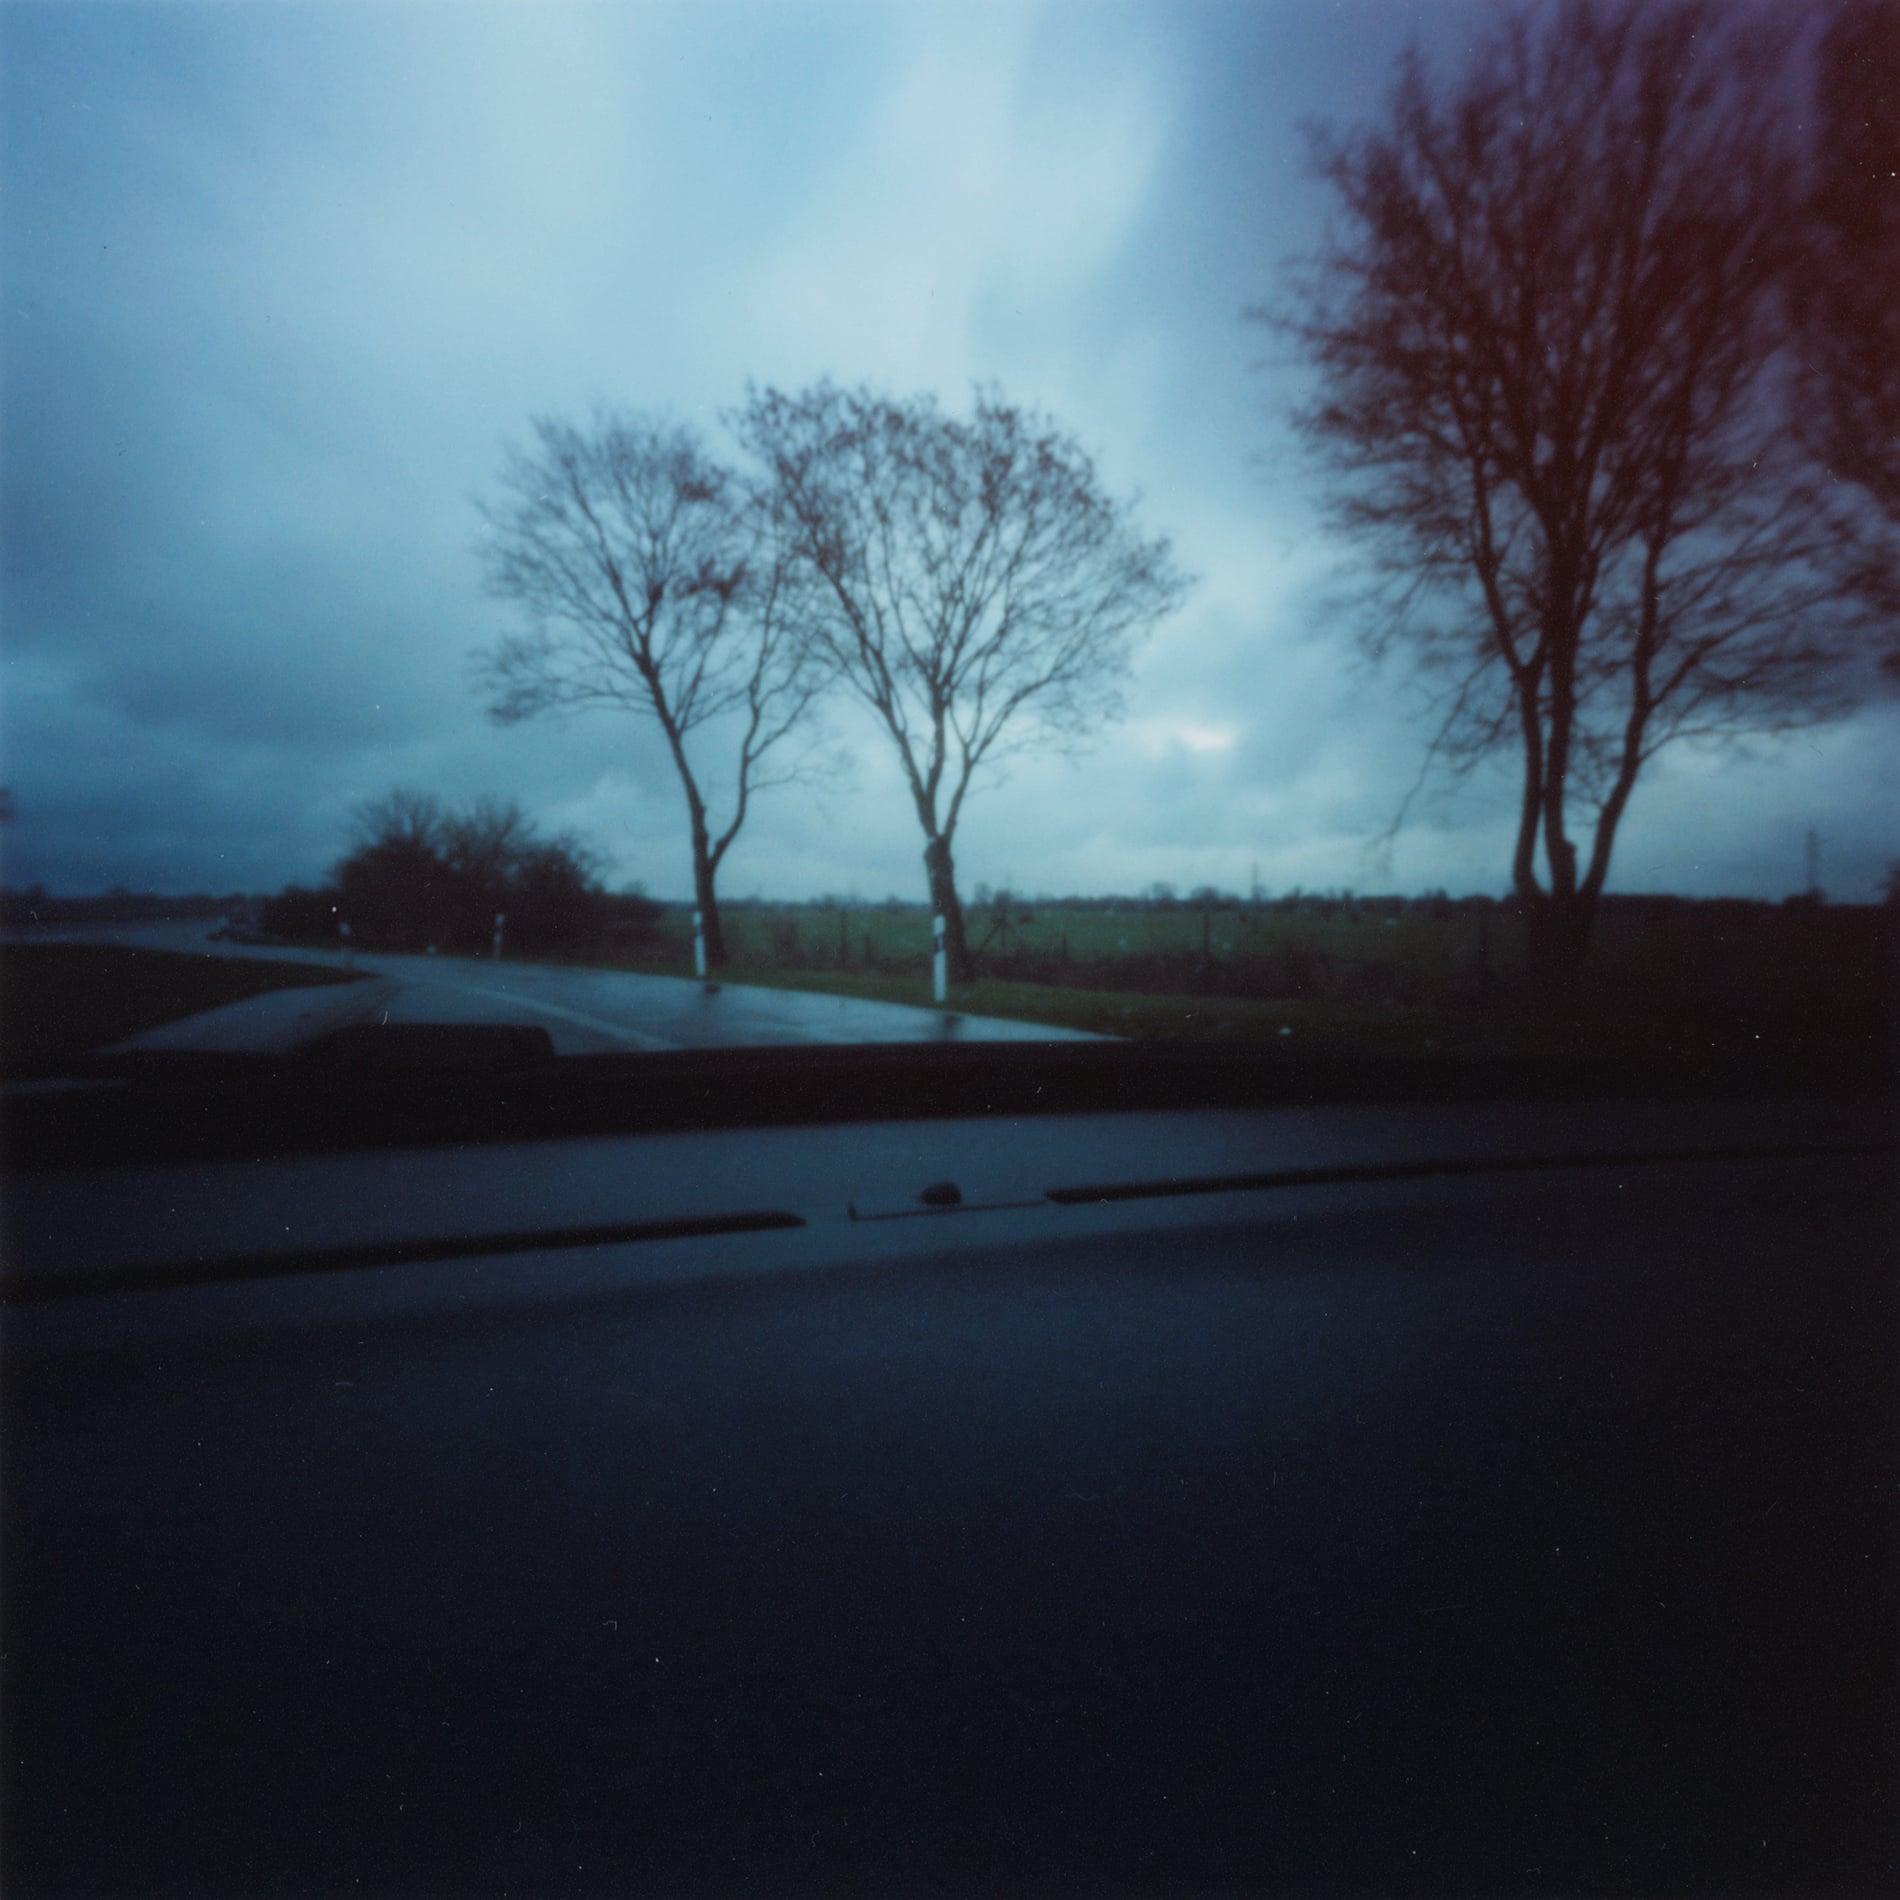 'dashboard pinhole on the road', 2019, c-print, 20x20cm